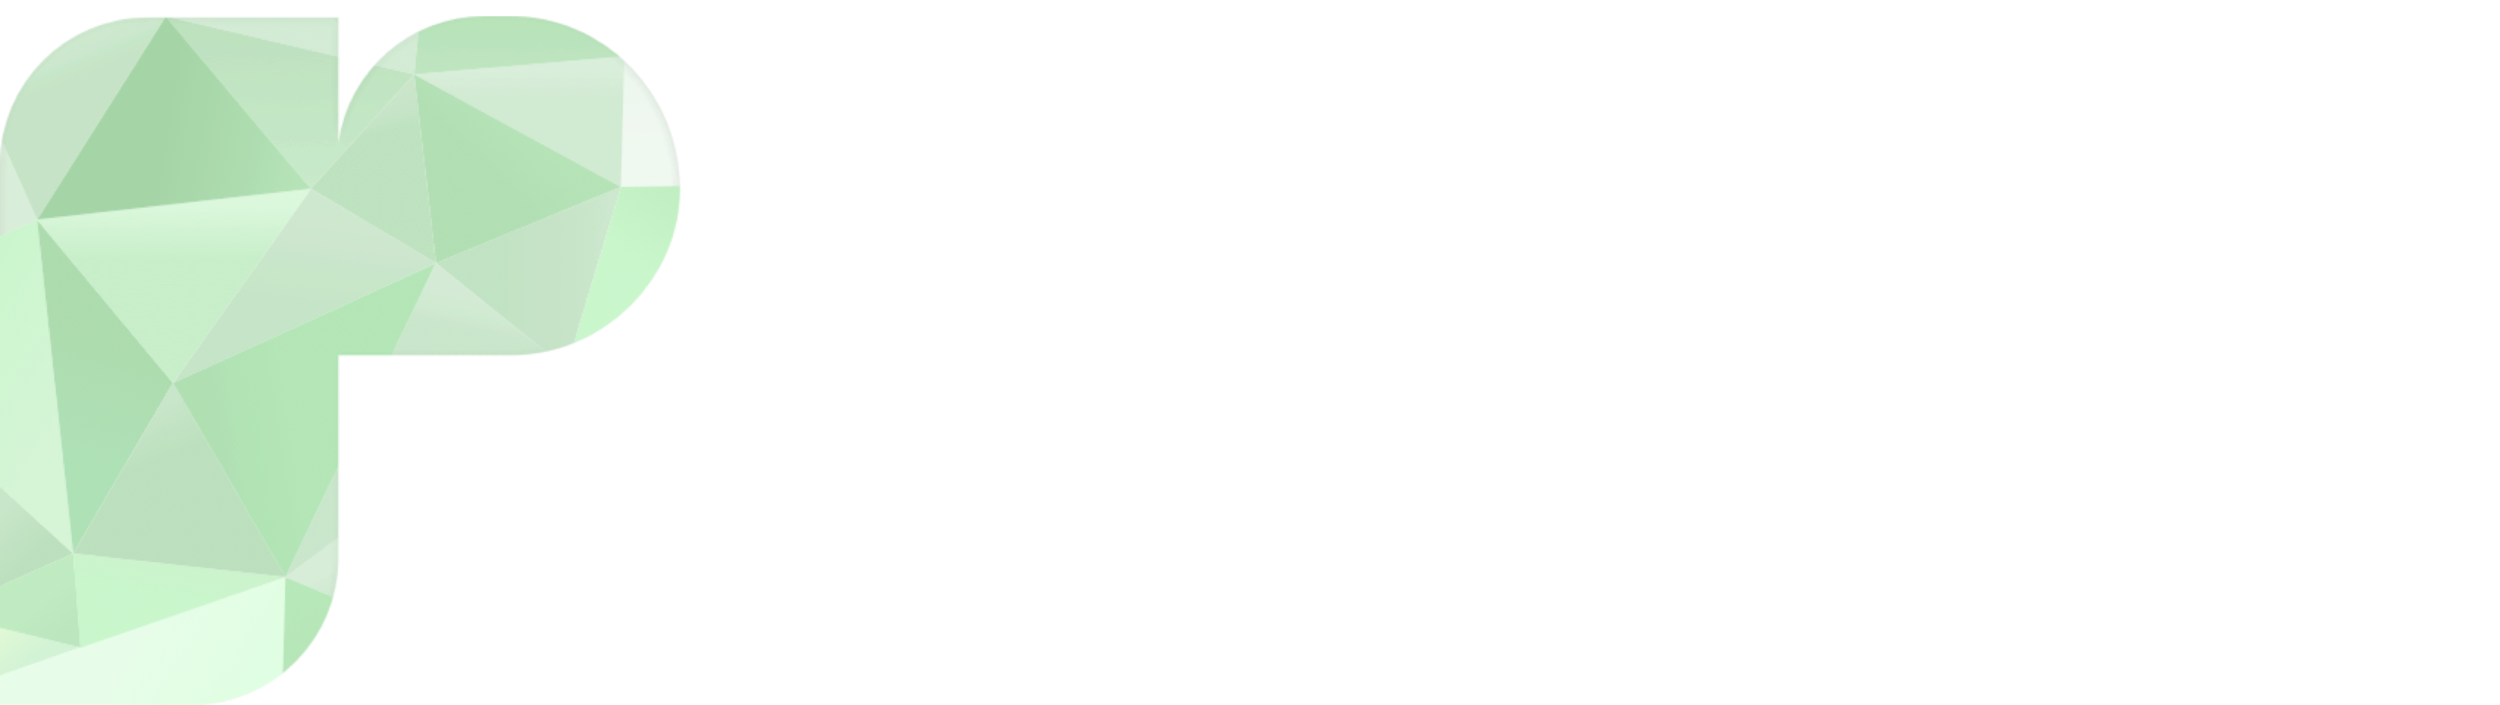 horizontal_logo copy.png